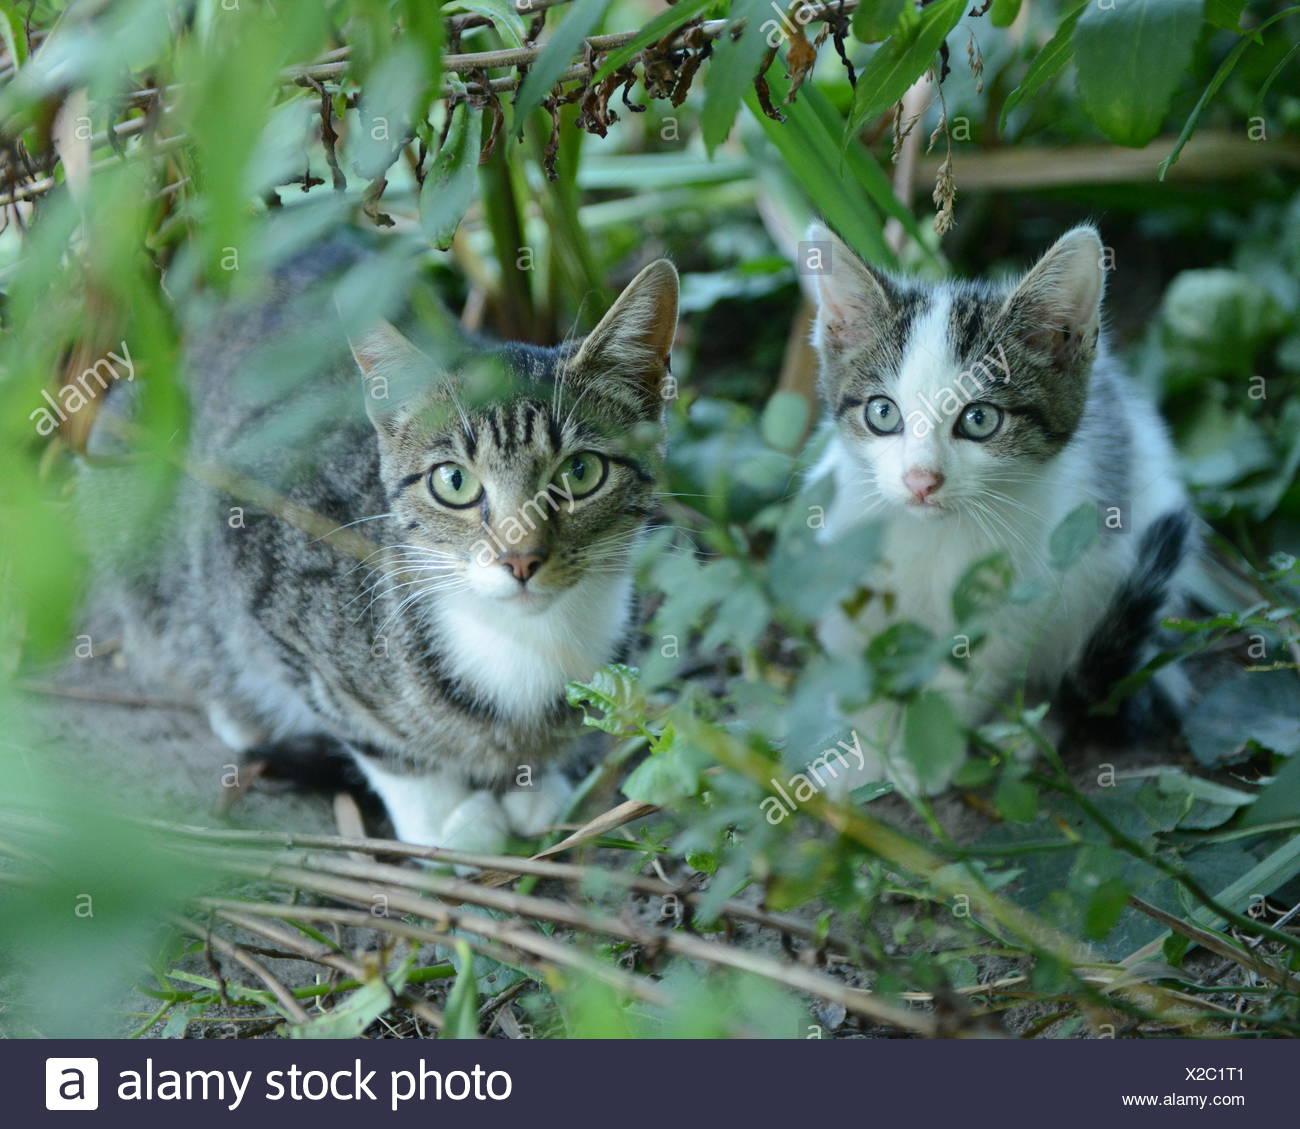 Cat In Backyard kitten and adult cat in backyard stock photo: 276860081 - alamy